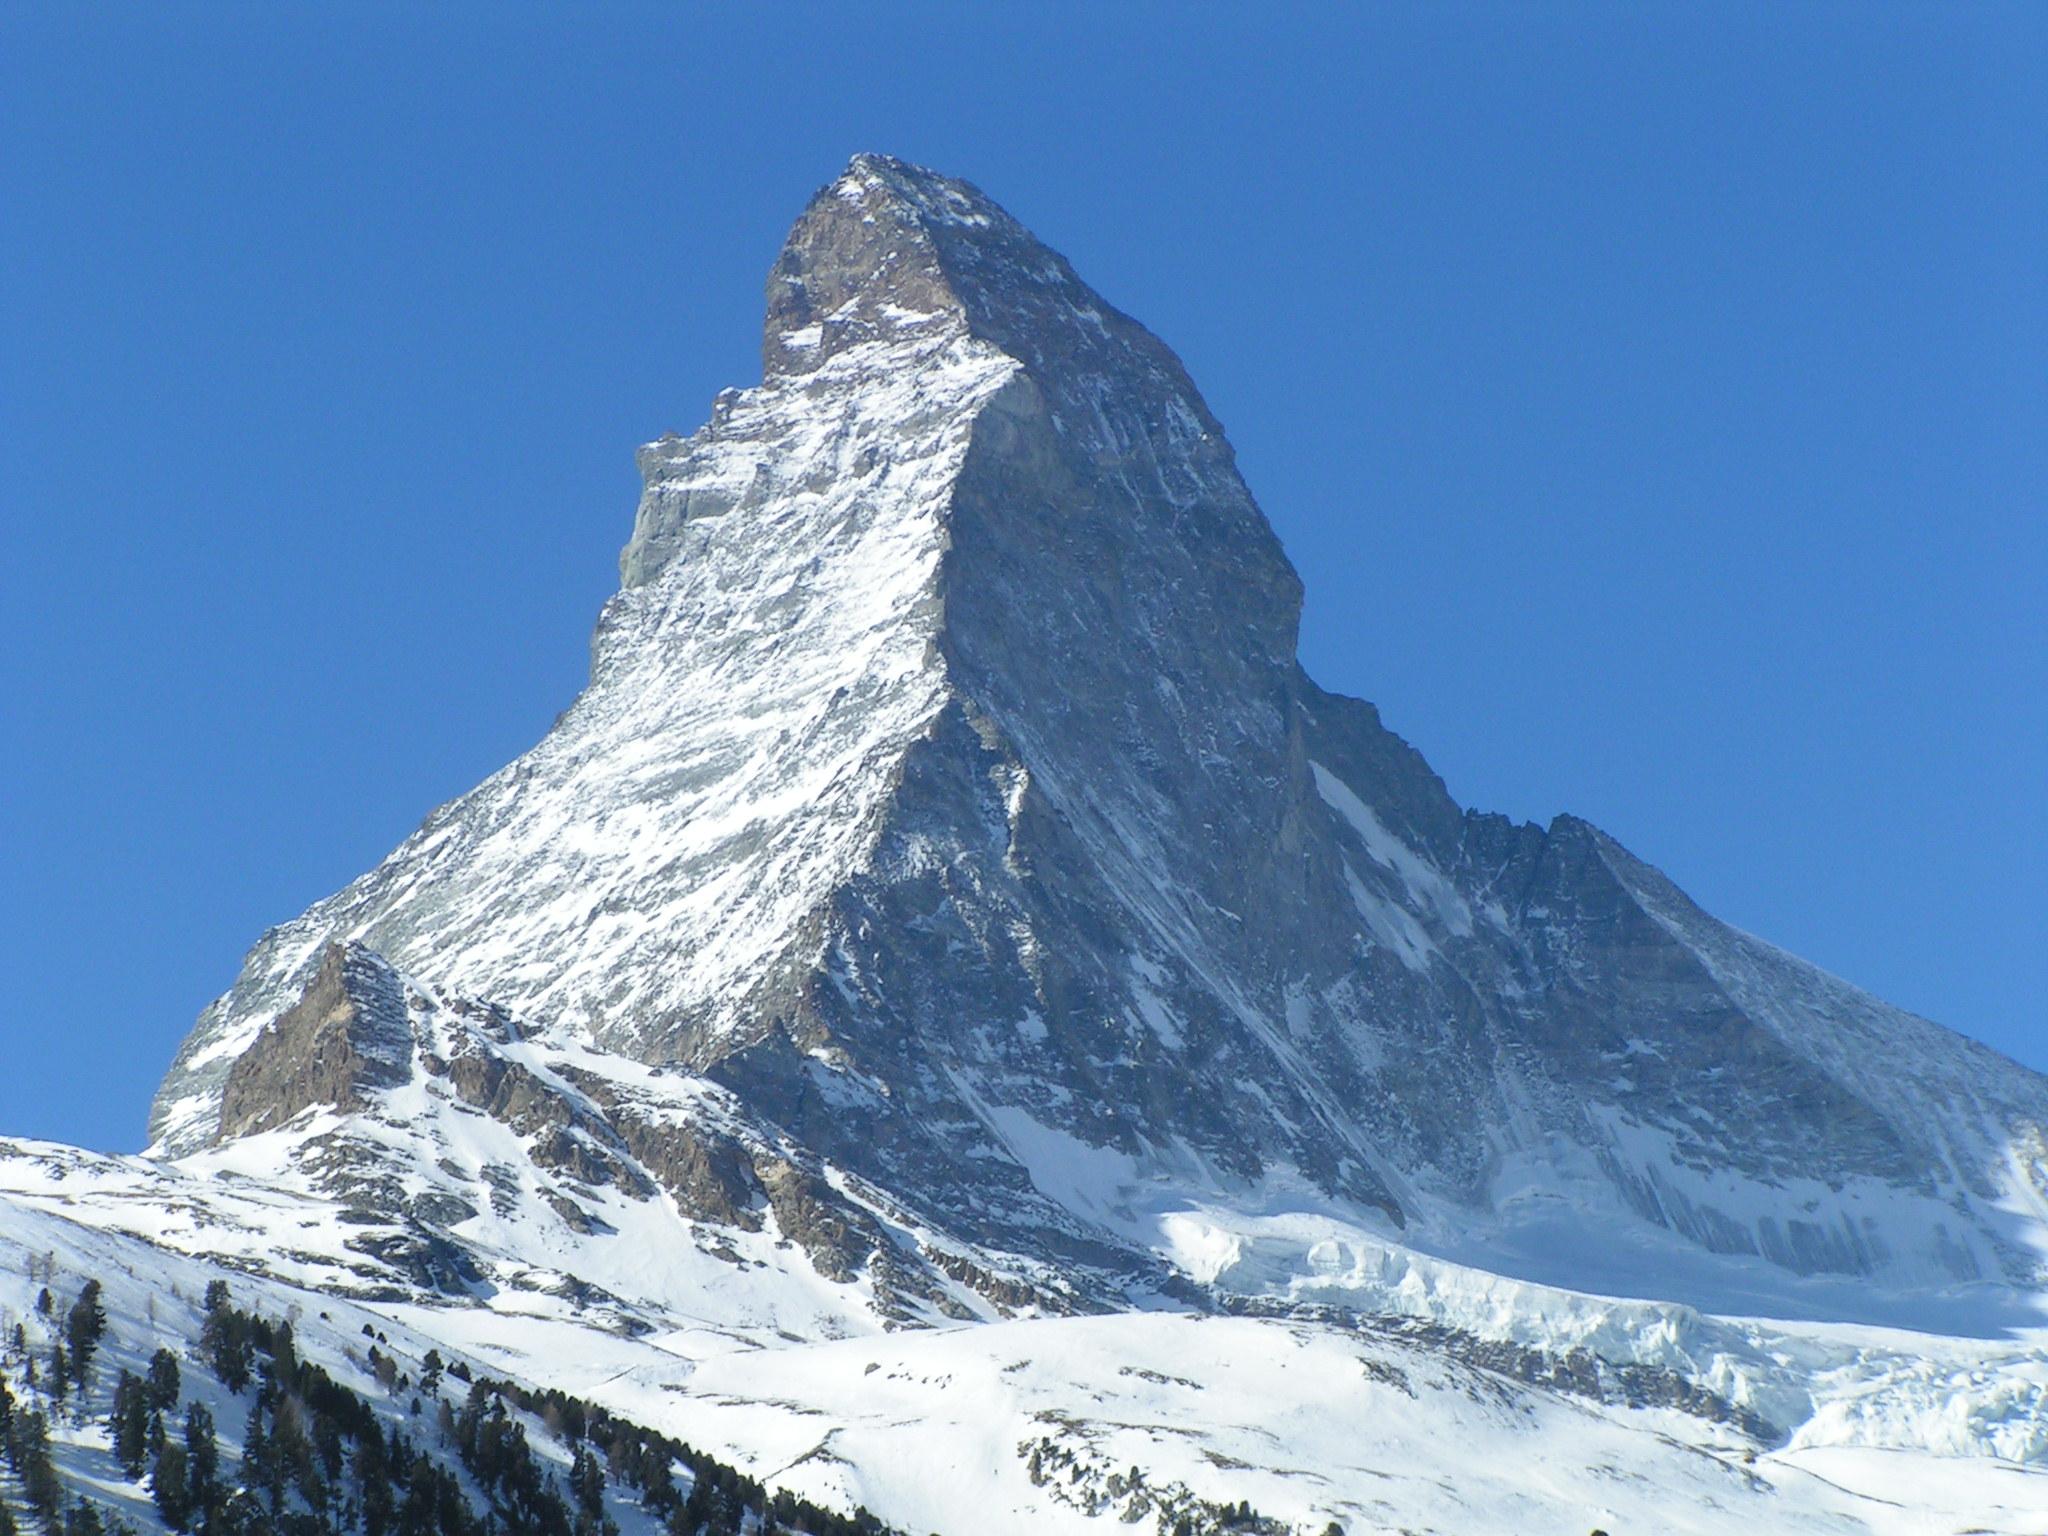 http://upload.wikimedia.org/wikipedia/commons/2/26/Matterhorn-EastAndNorthside-viewedFromZermatt_landscapeformat.jpg